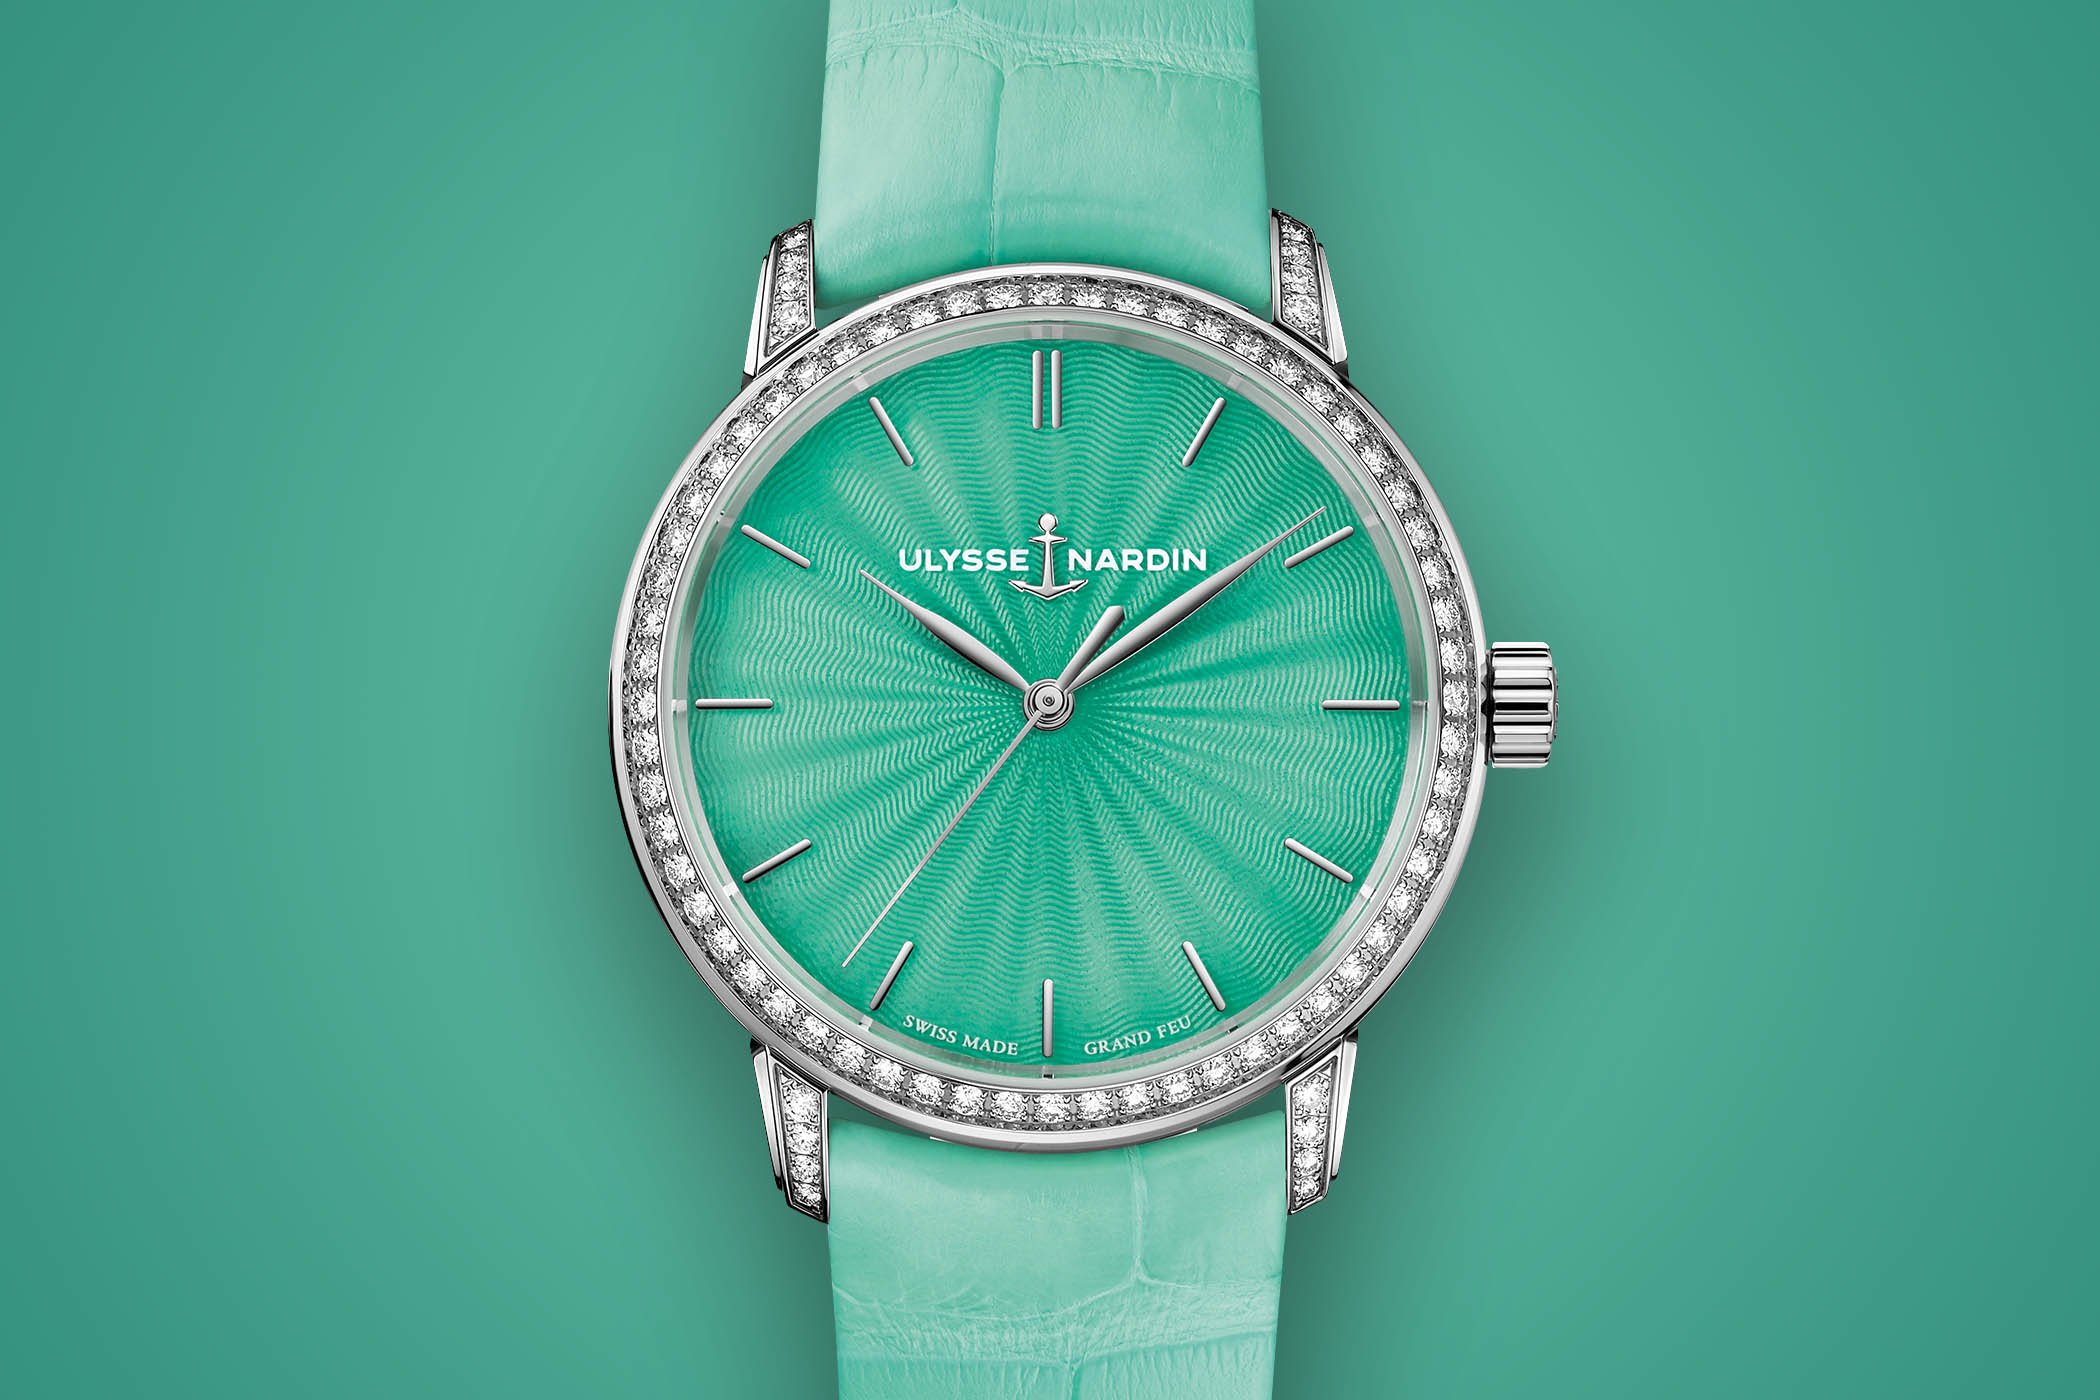 Women's Watch Wednesday – Ulysse Nardin Classico Lady Grand Feu